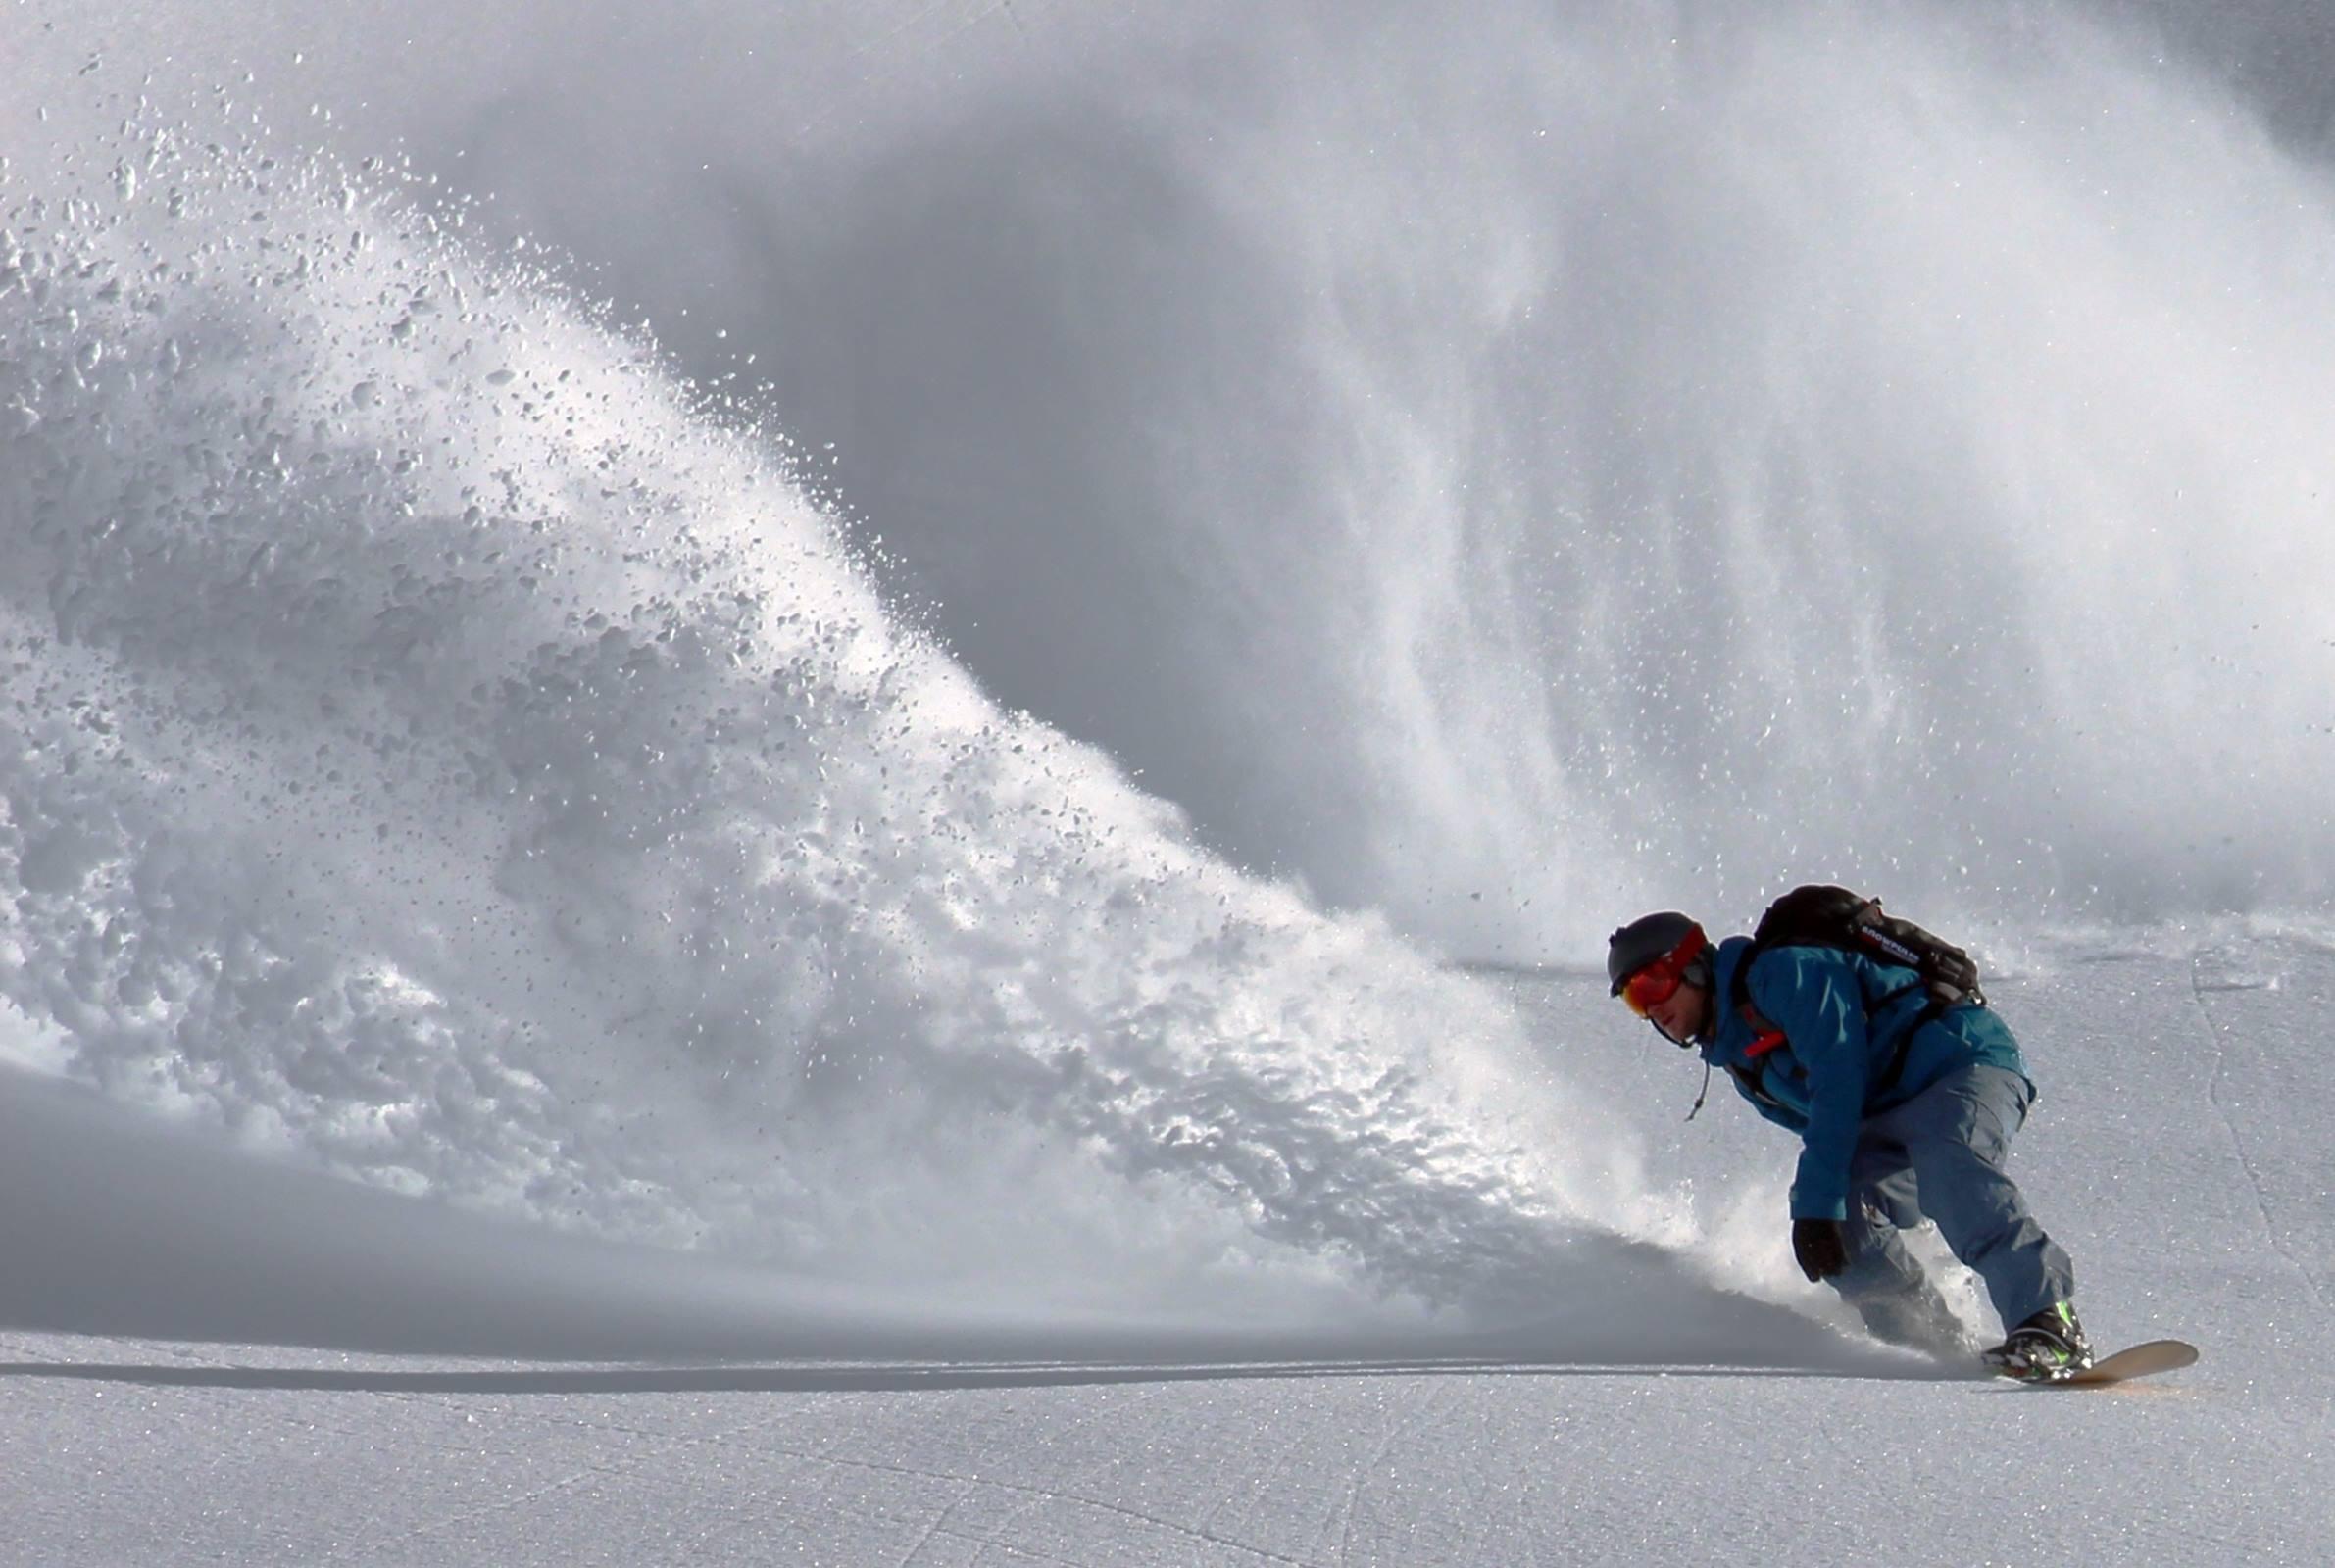 winter snow snowboarding man ski slope